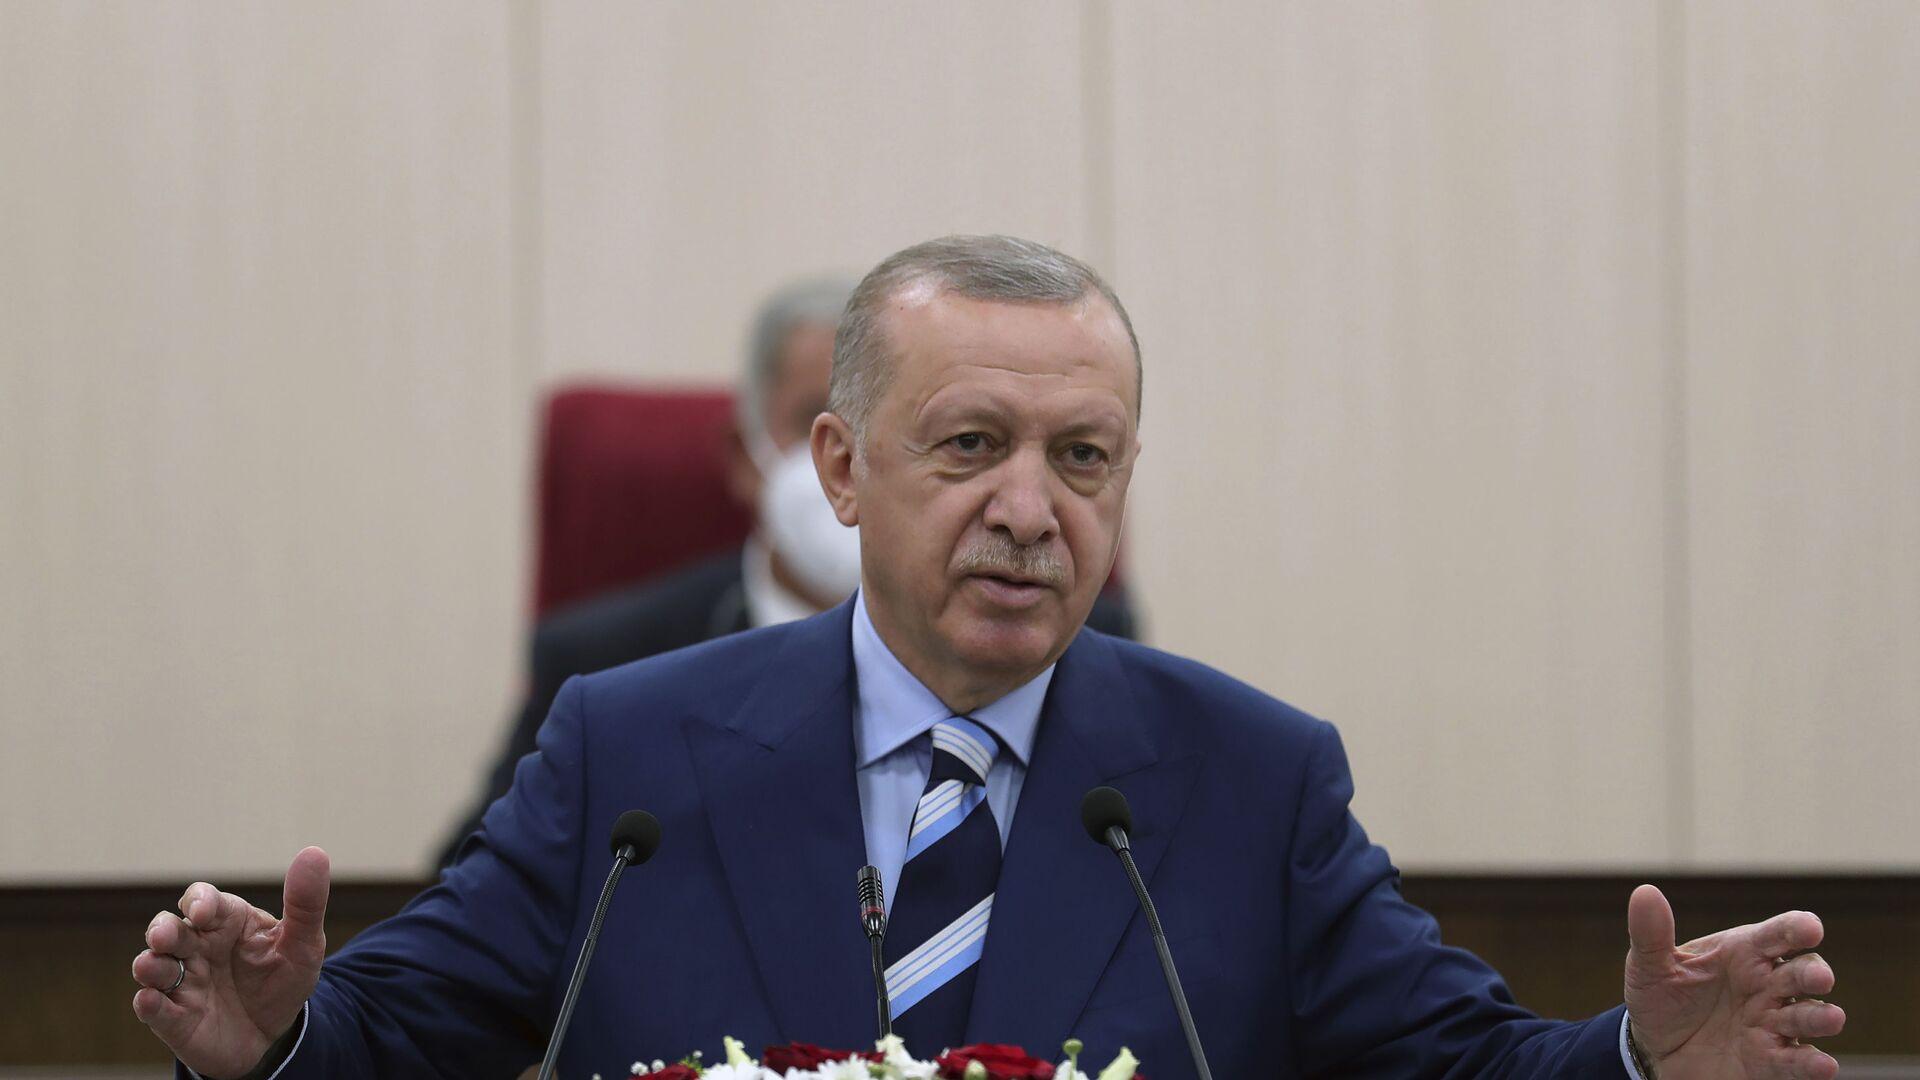 Президент Турции Реджеп Тайип Эрдоган, фото из архива - Sputnik Azərbaycan, 1920, 19.09.2021